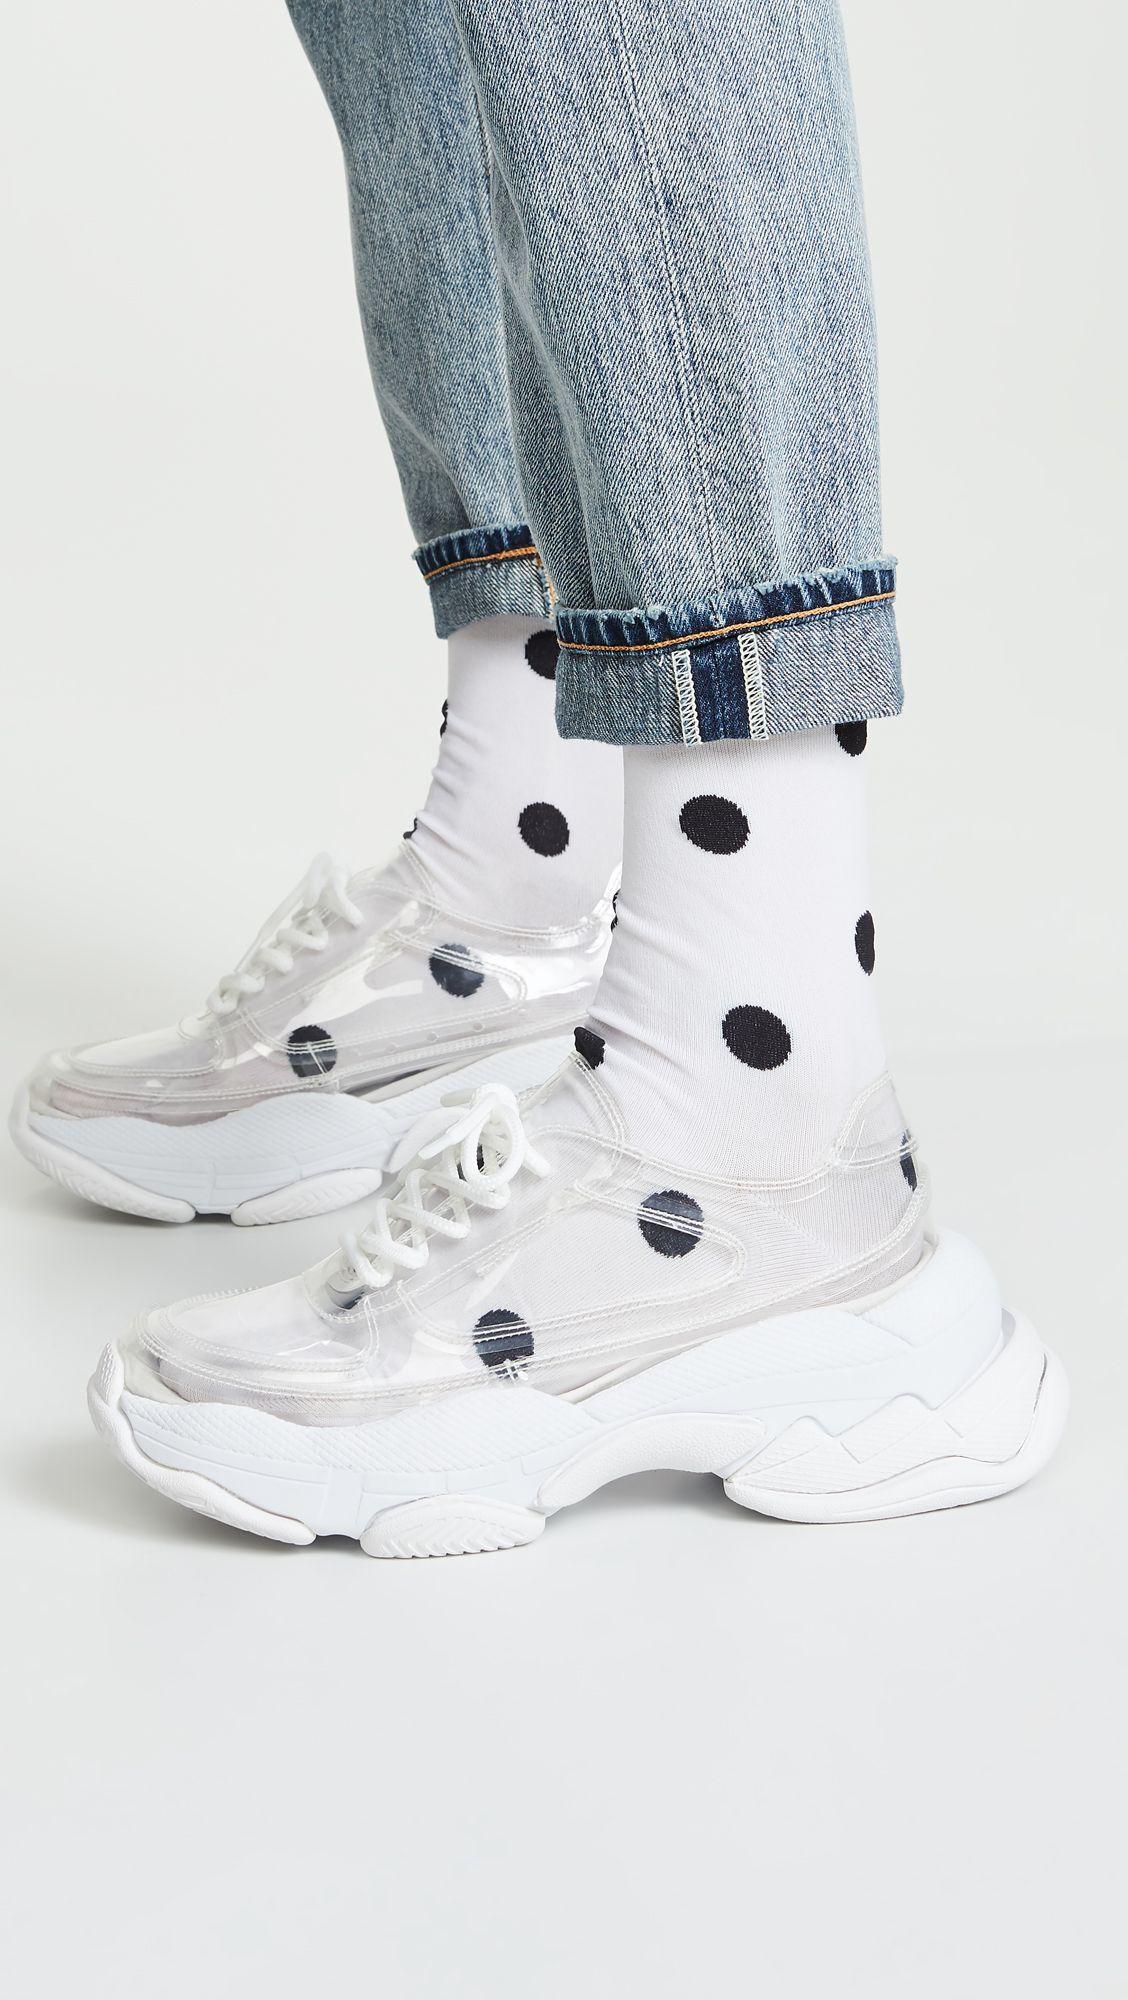 Platform sneakers, Athletic fashion